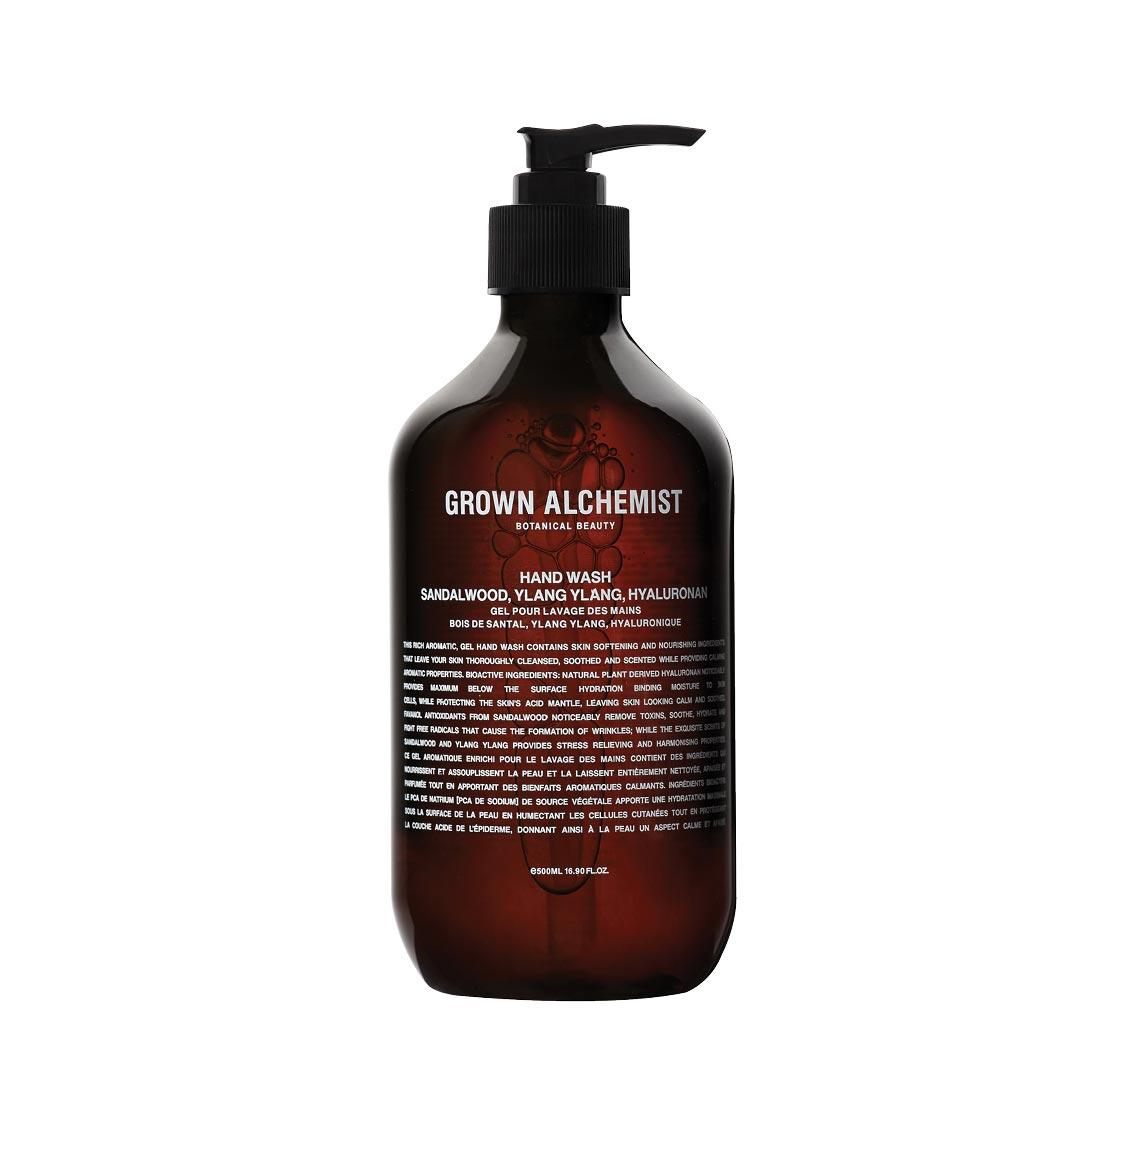 Grown Alchemist Hand Wash Sandalwood Ylang Ylang and Hyaluronan 500ml